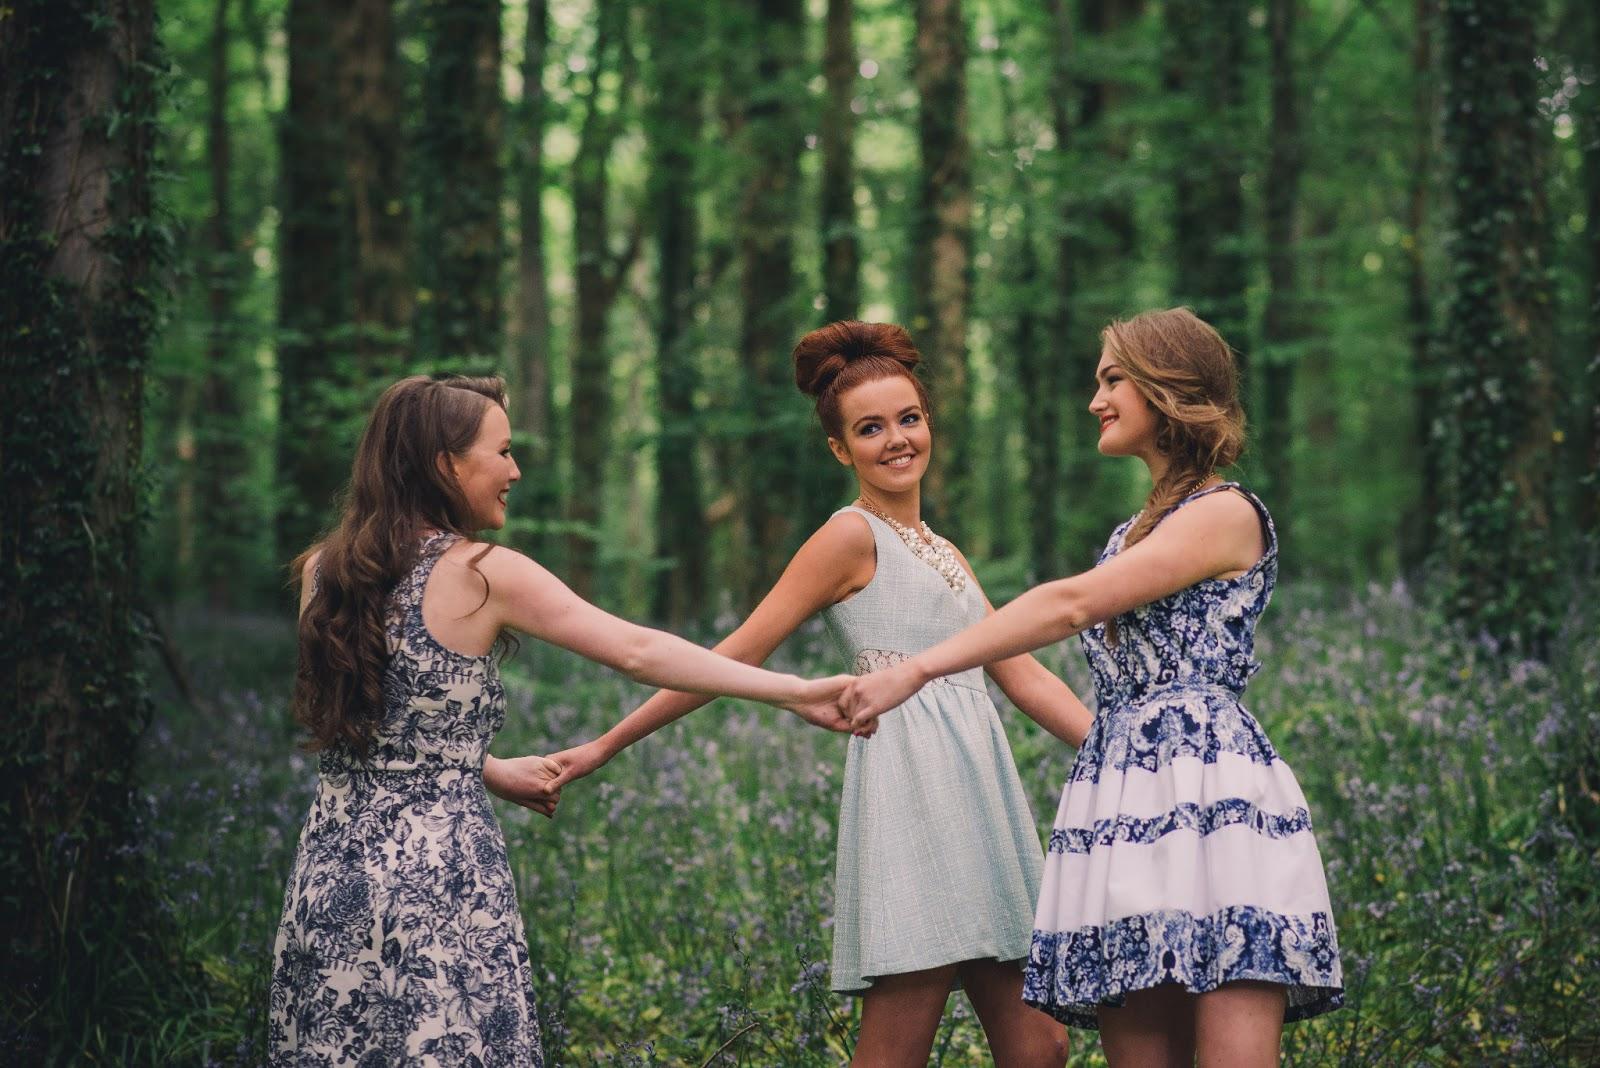 Best Friends Photography Capture Your Friendship